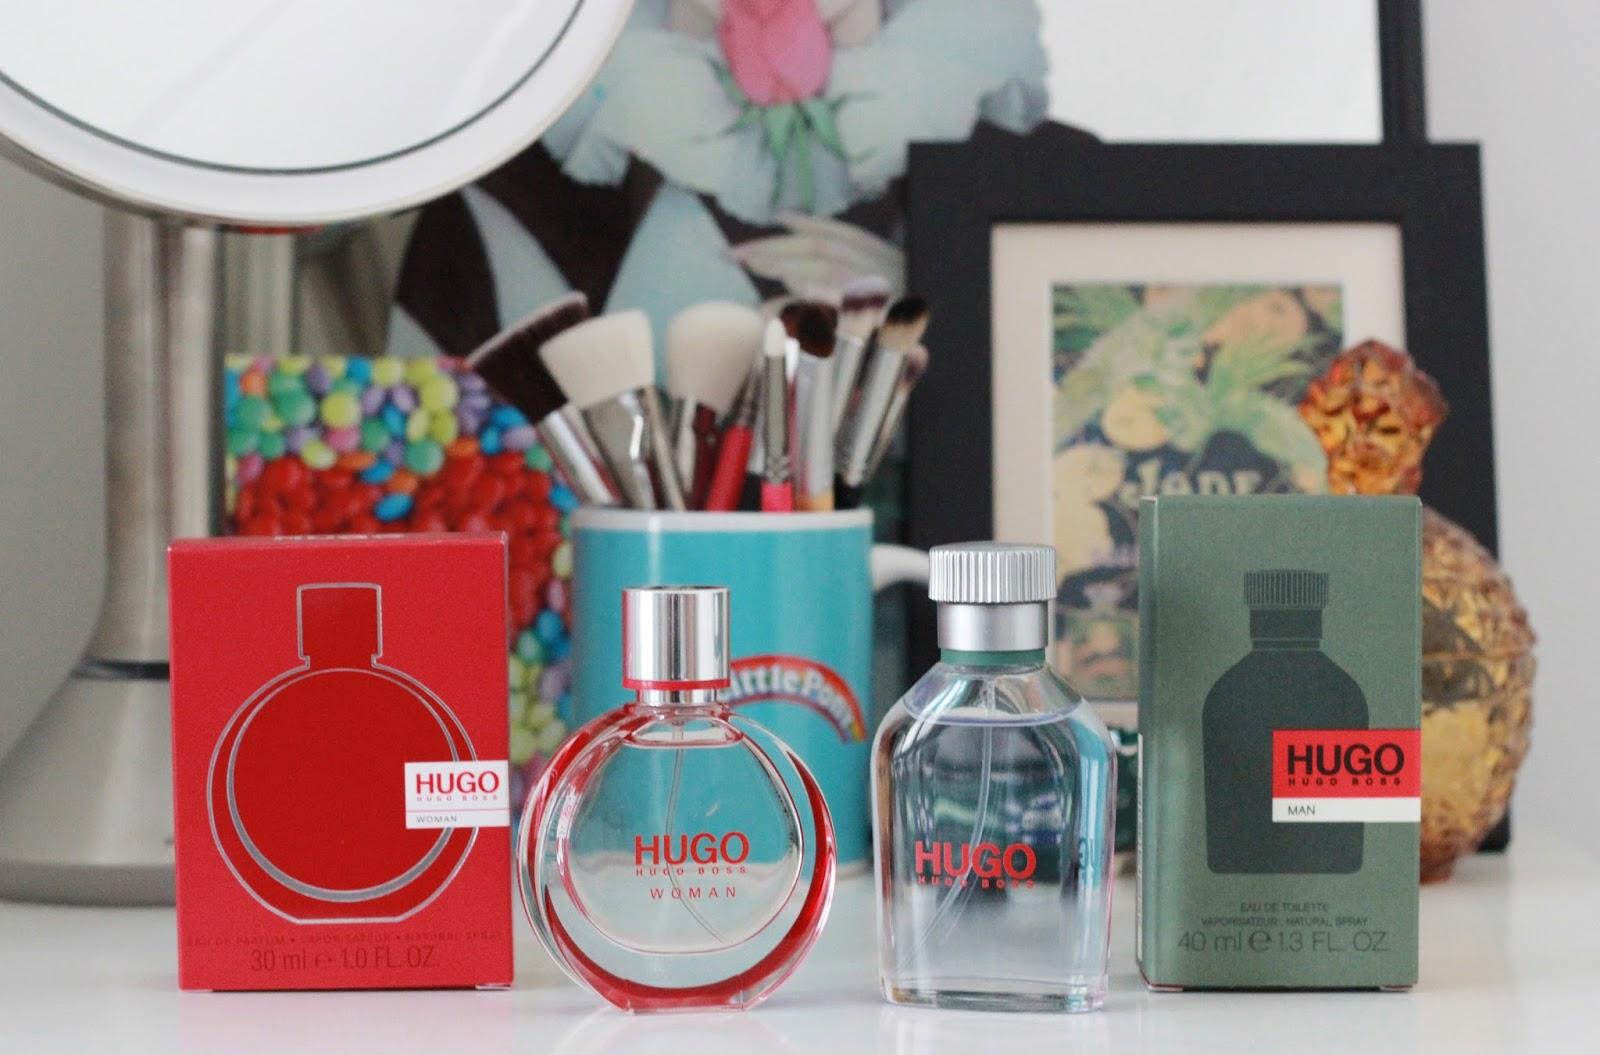 Hugo Boss Woman and Hugo Boss Man fragrances